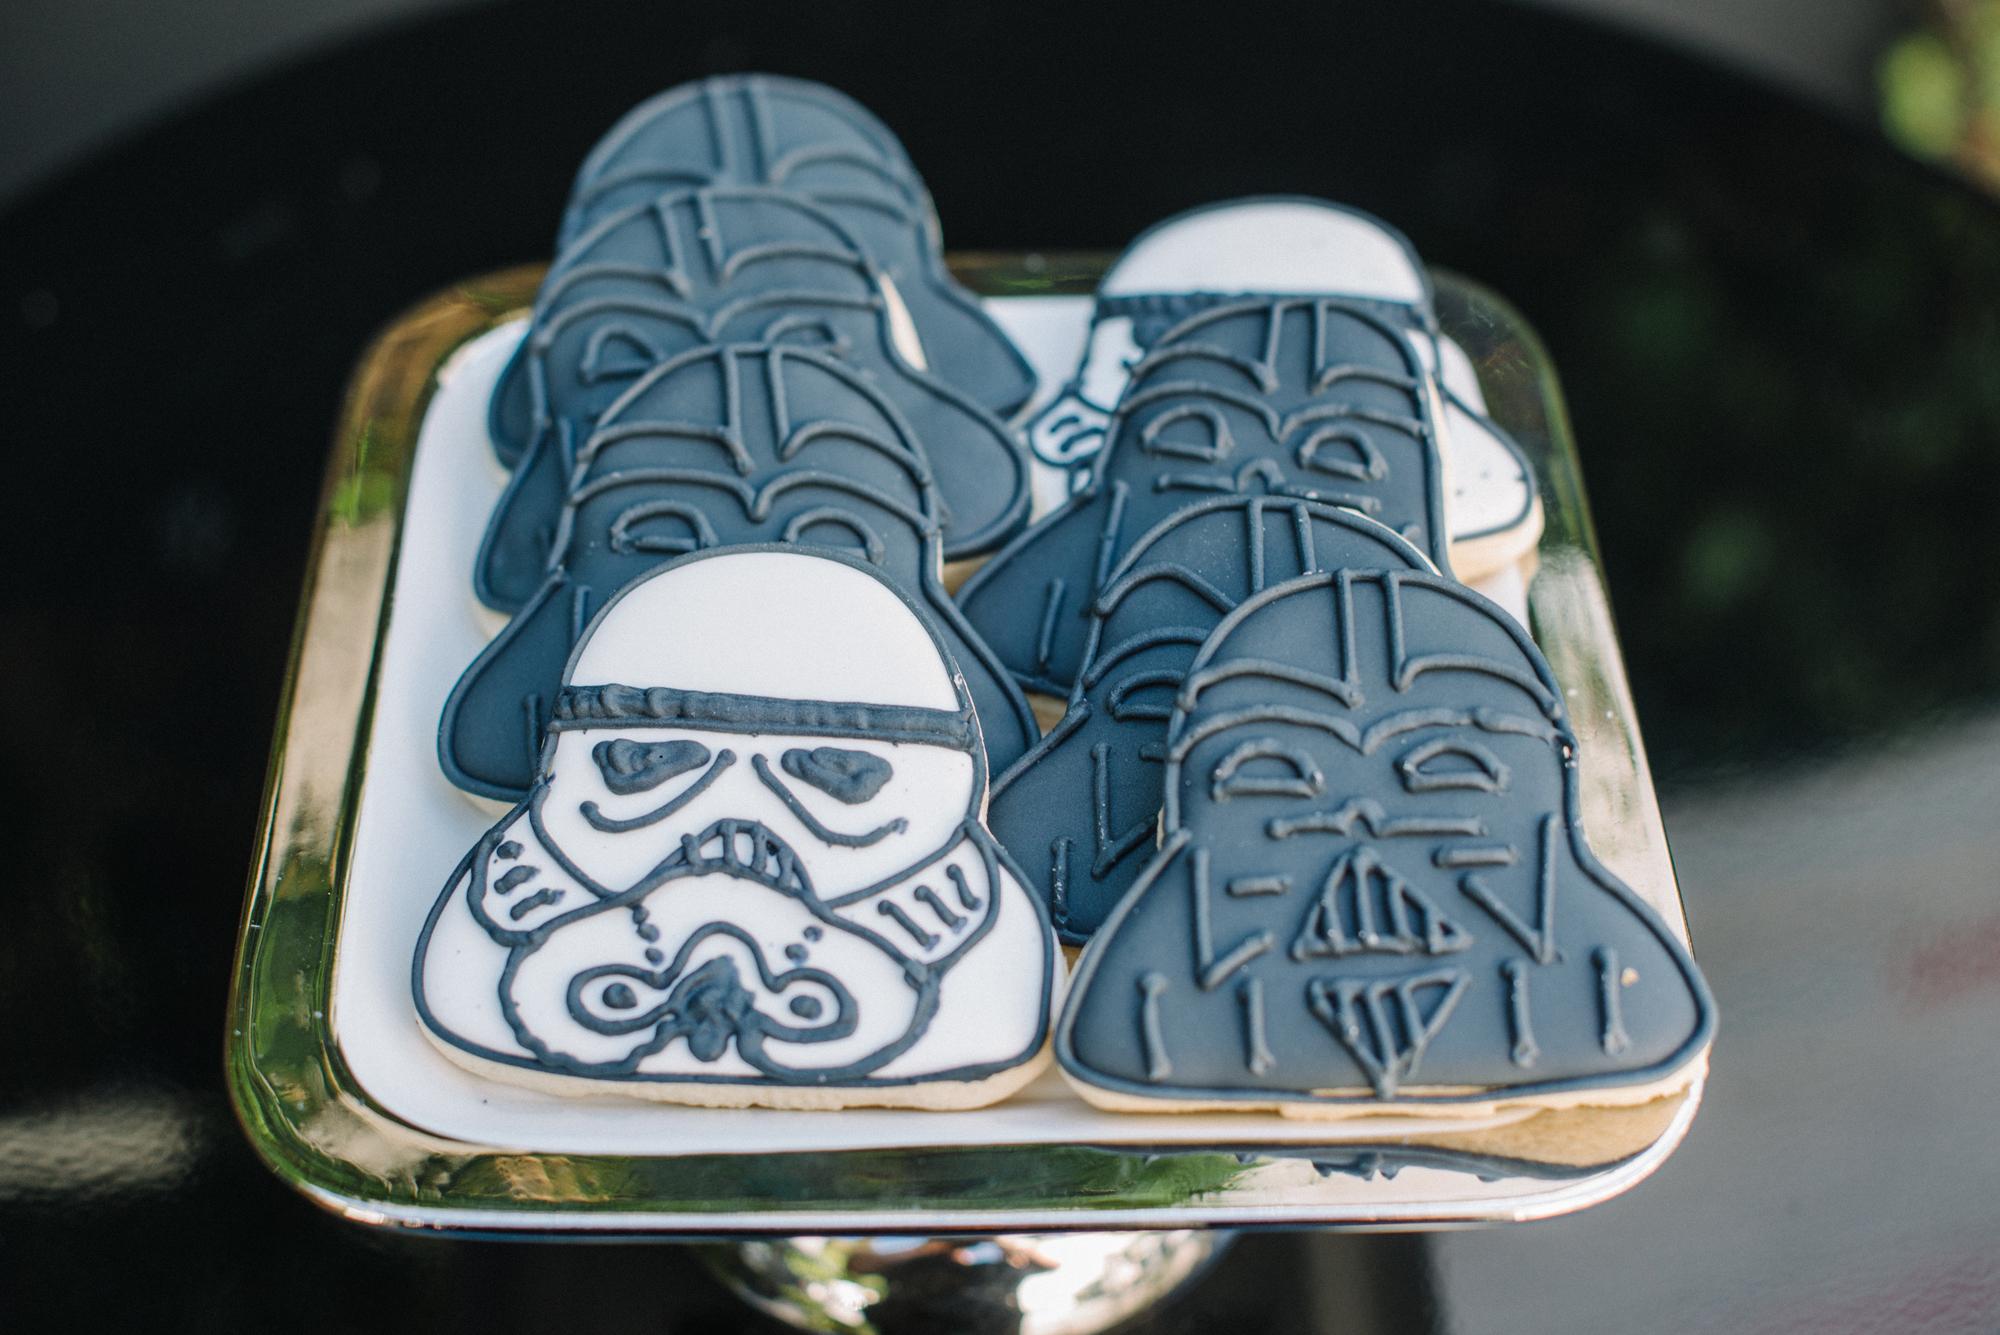 tarynco-events-starwars-themed-kids-birthday-party-darthvader-cookies.jpg